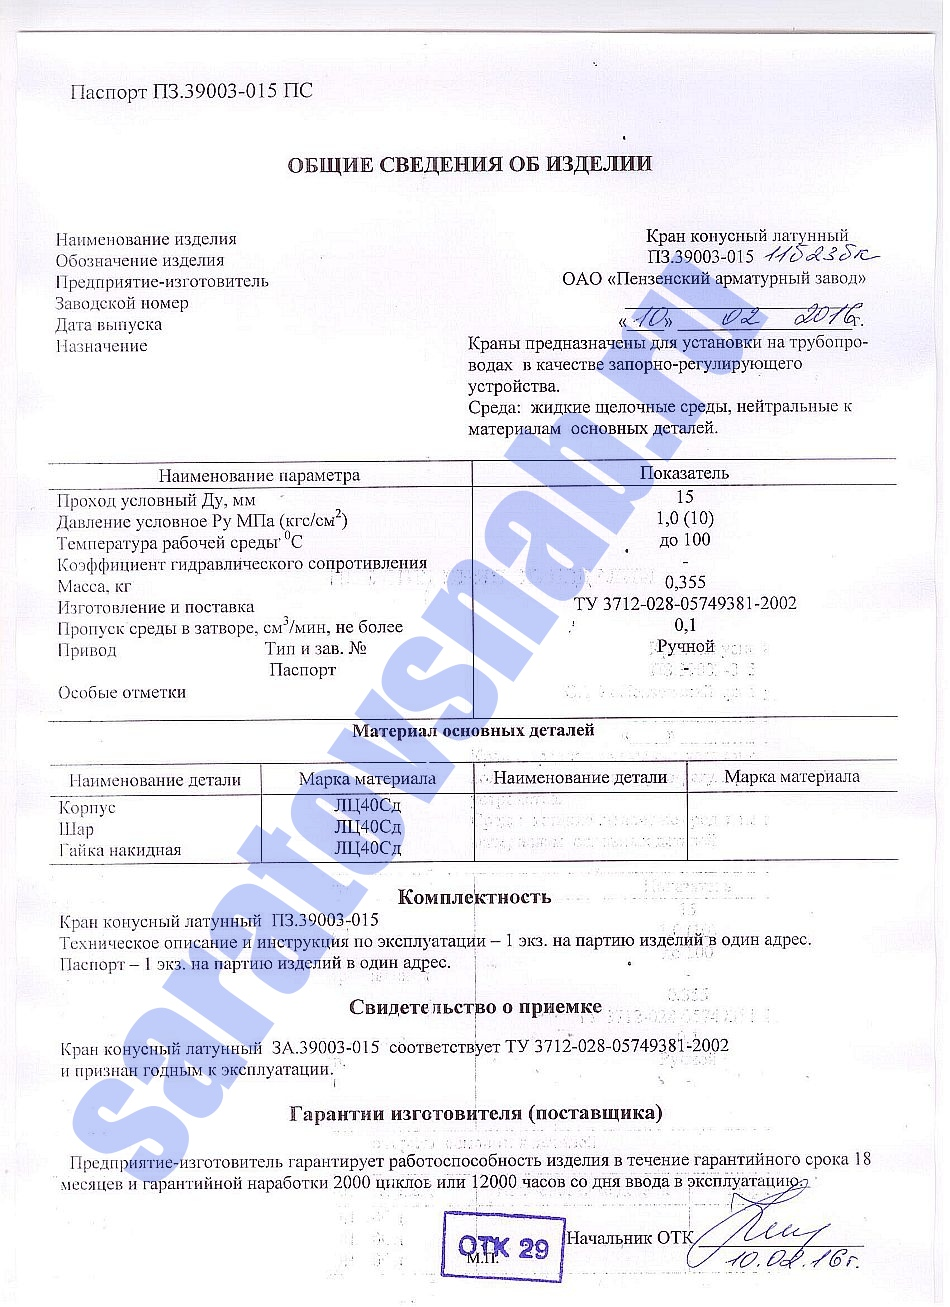 pasport_11b23bk